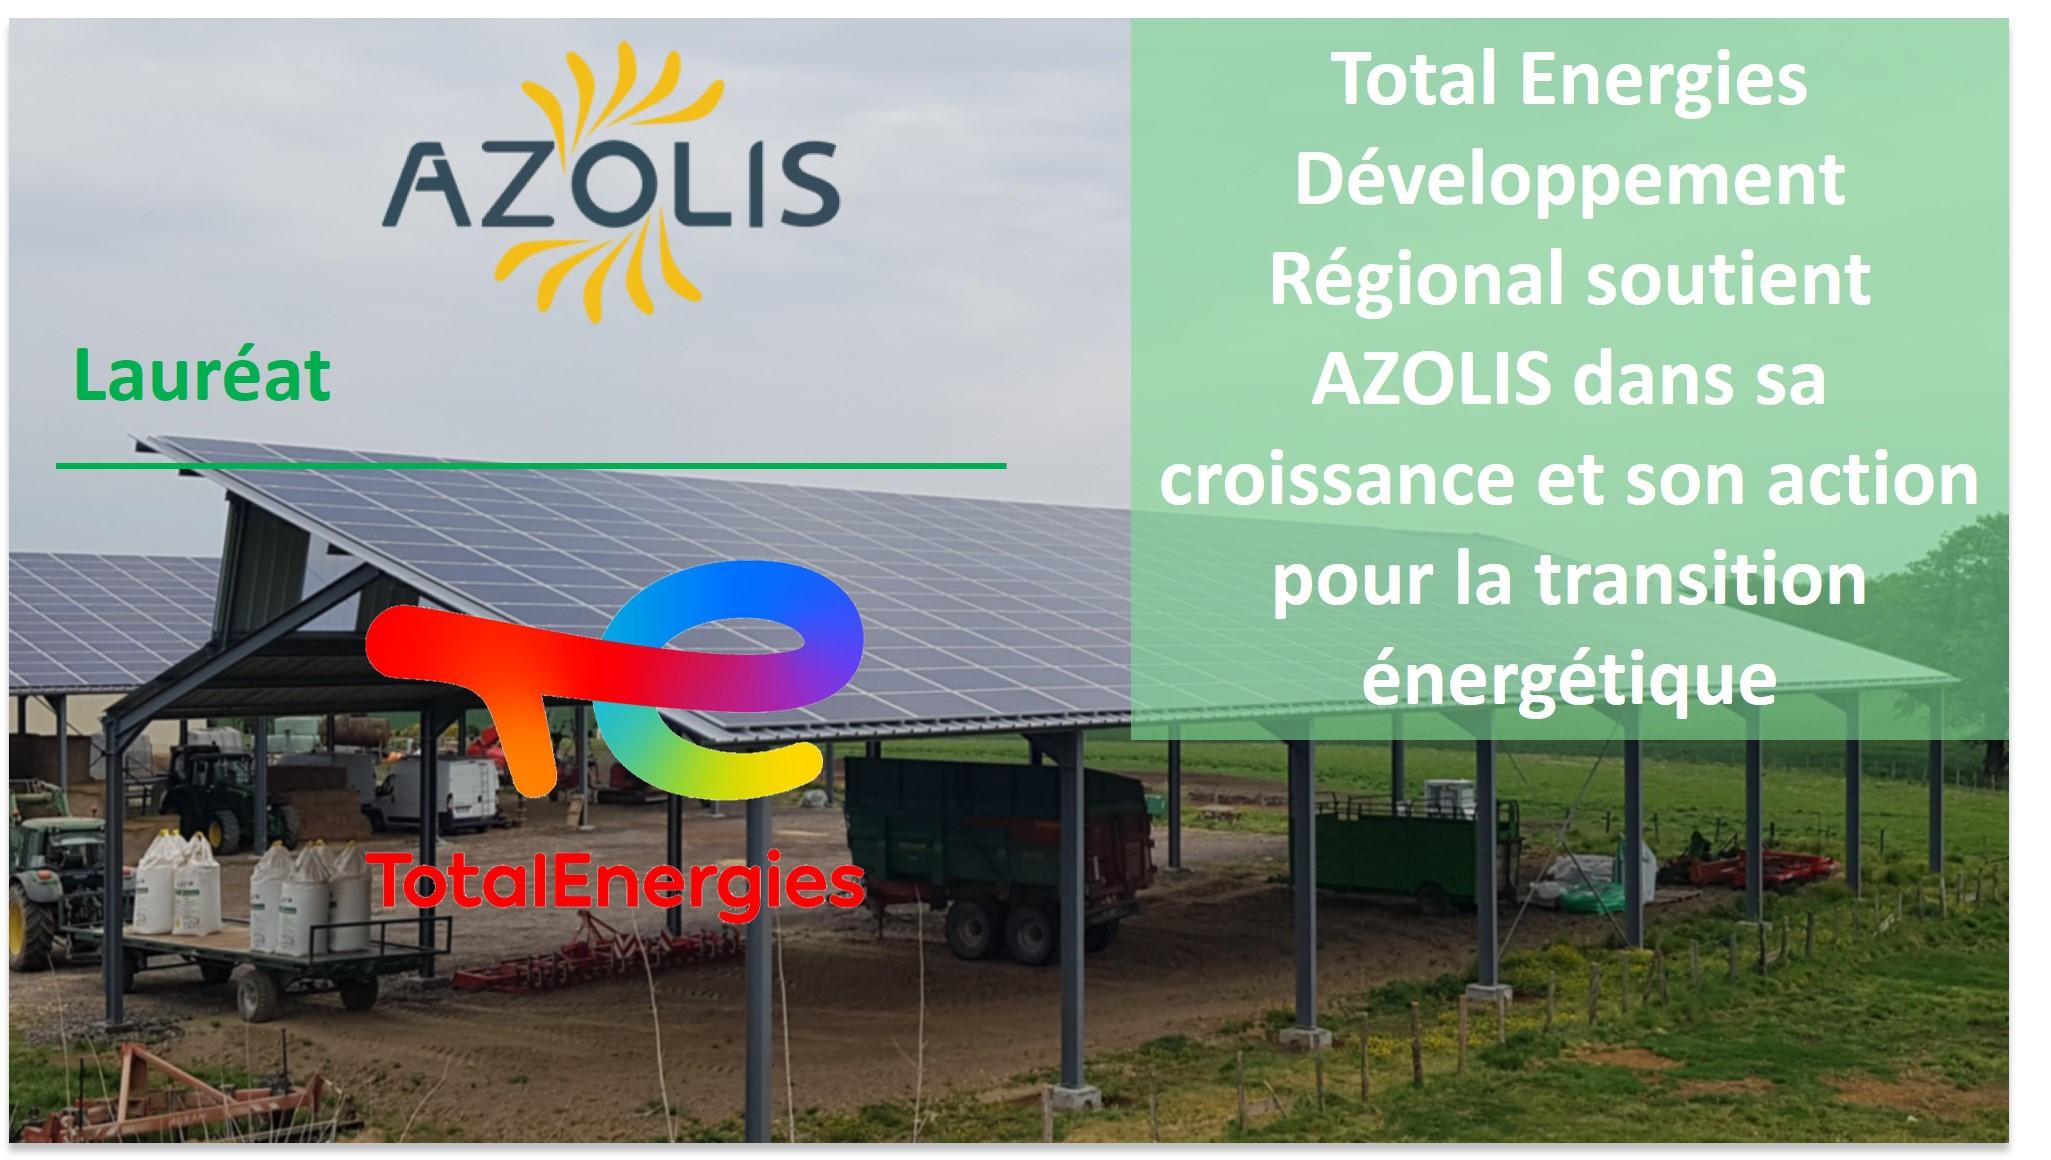 AZOLIS LAUREAT DE TOTAL DEVELOPPEMENT REGIONAL